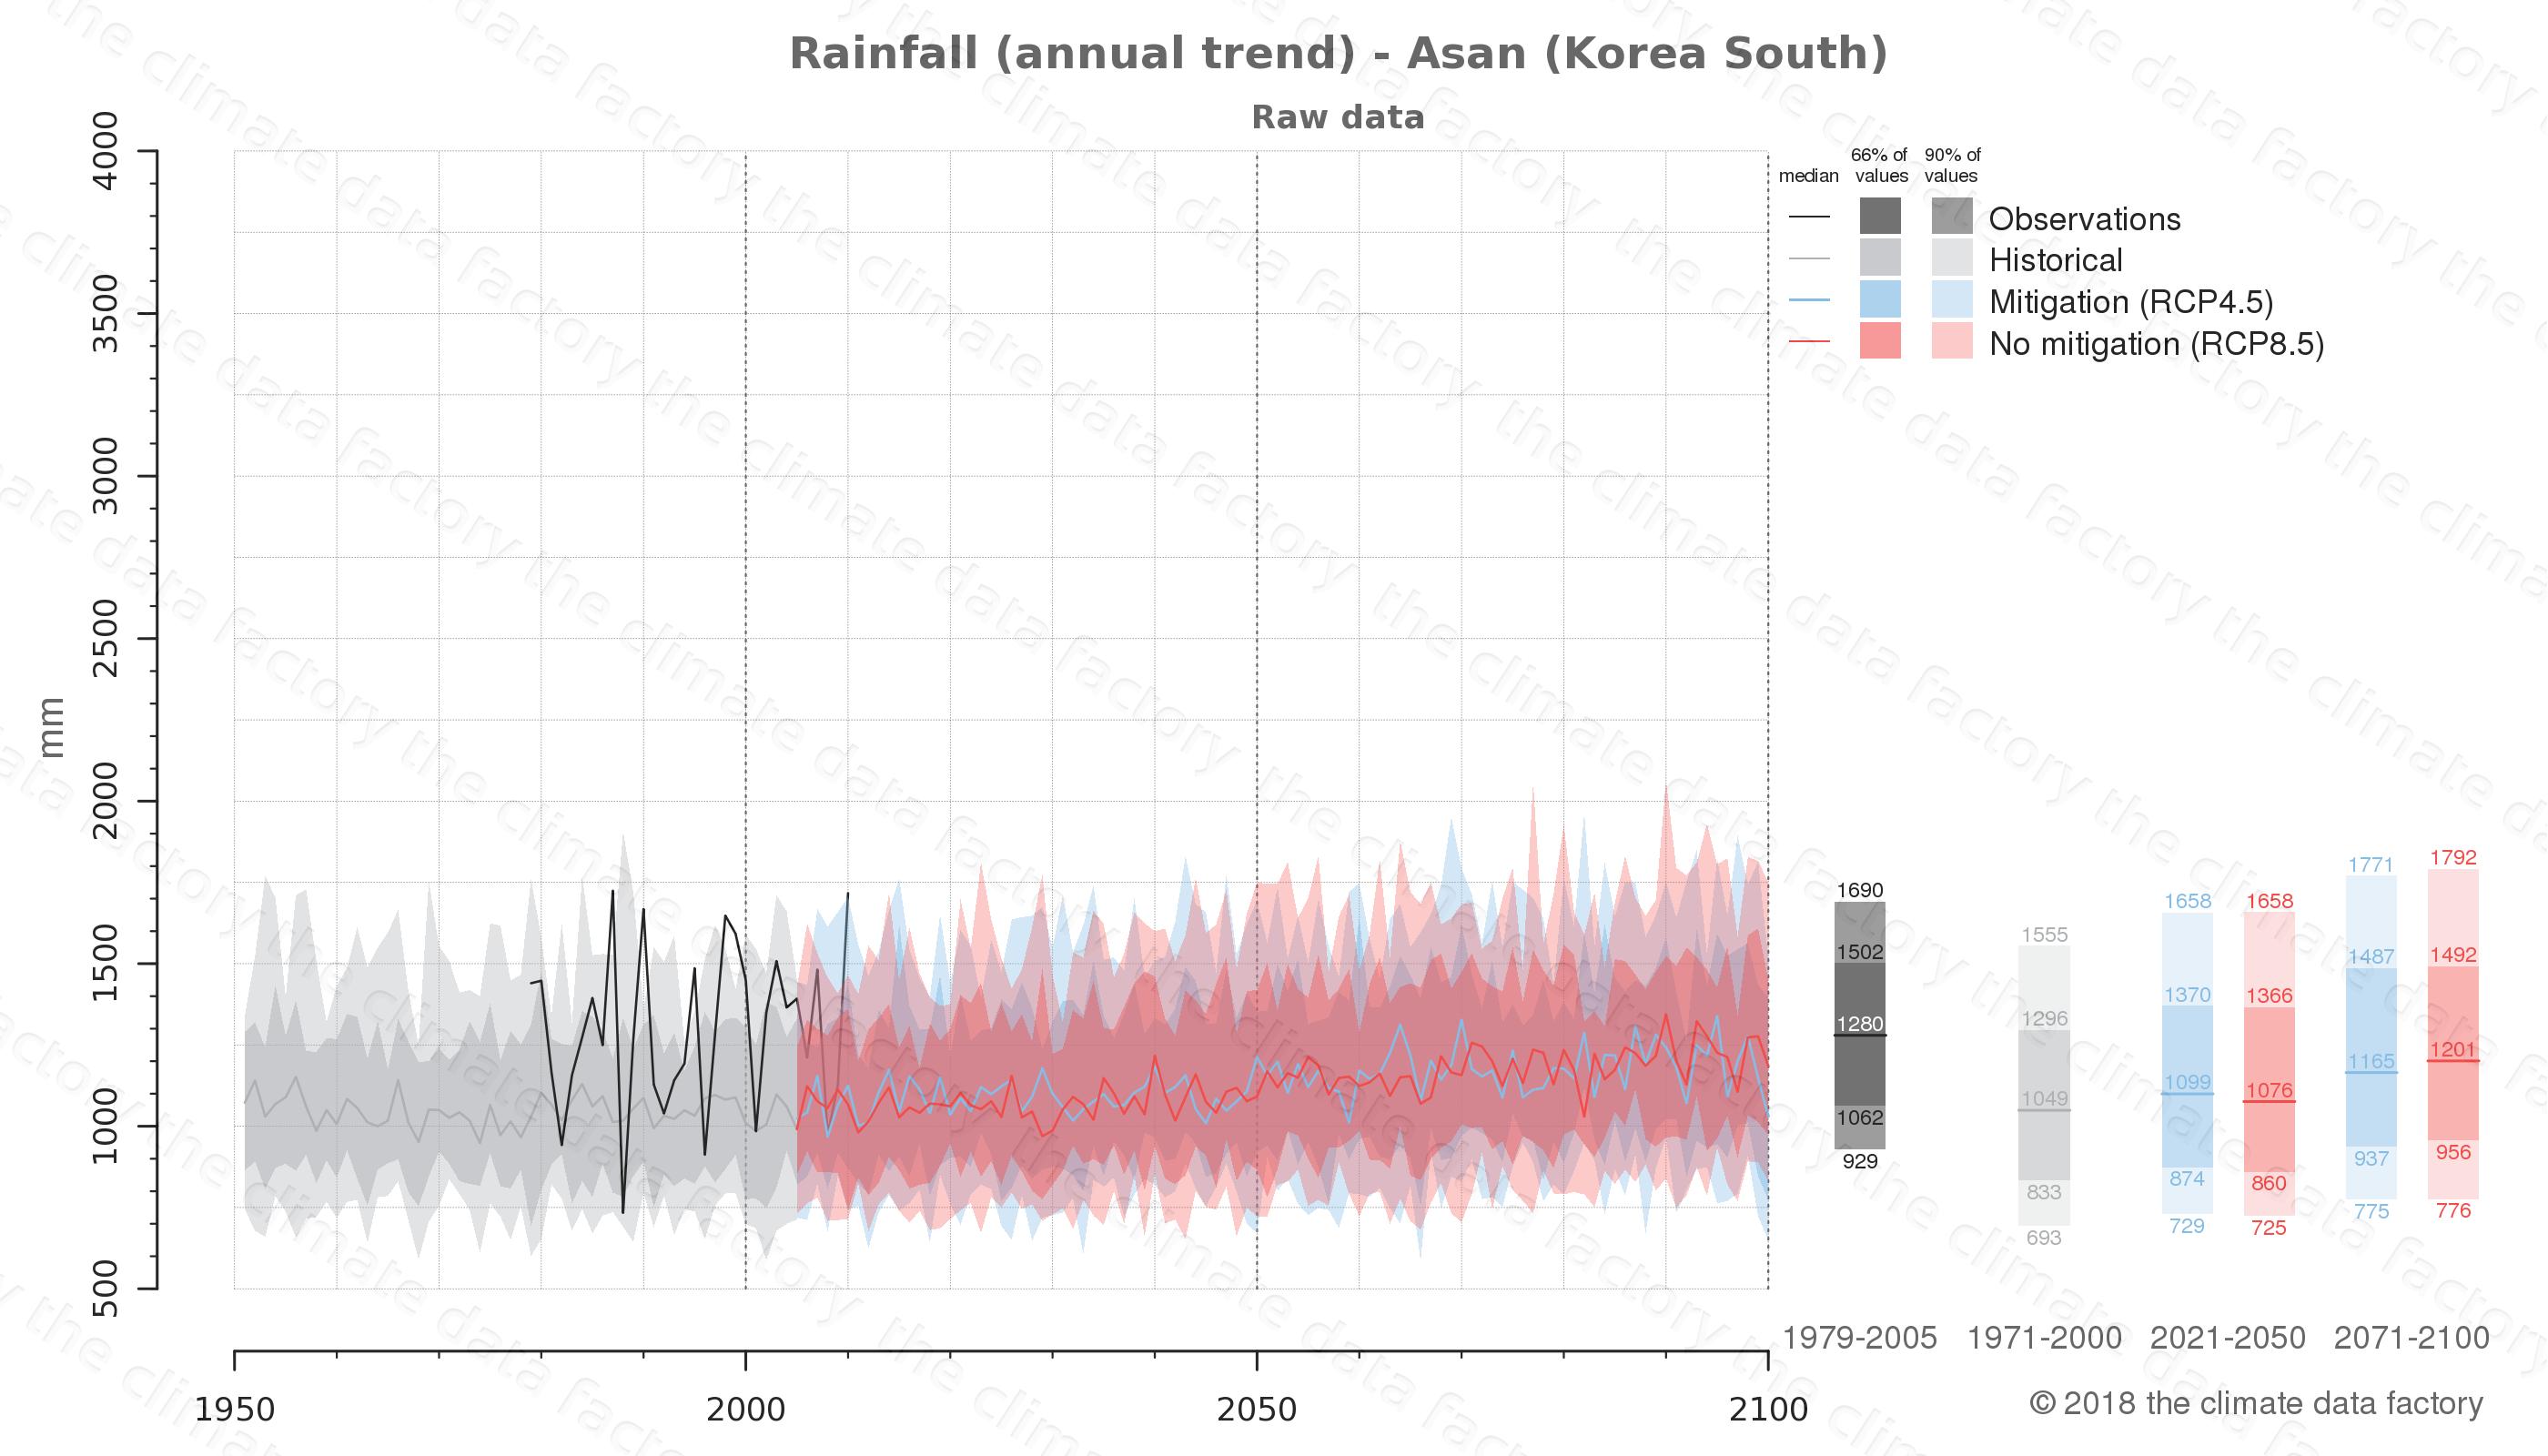 climate change data policy adaptation climate graph city data rainfall asan south korea